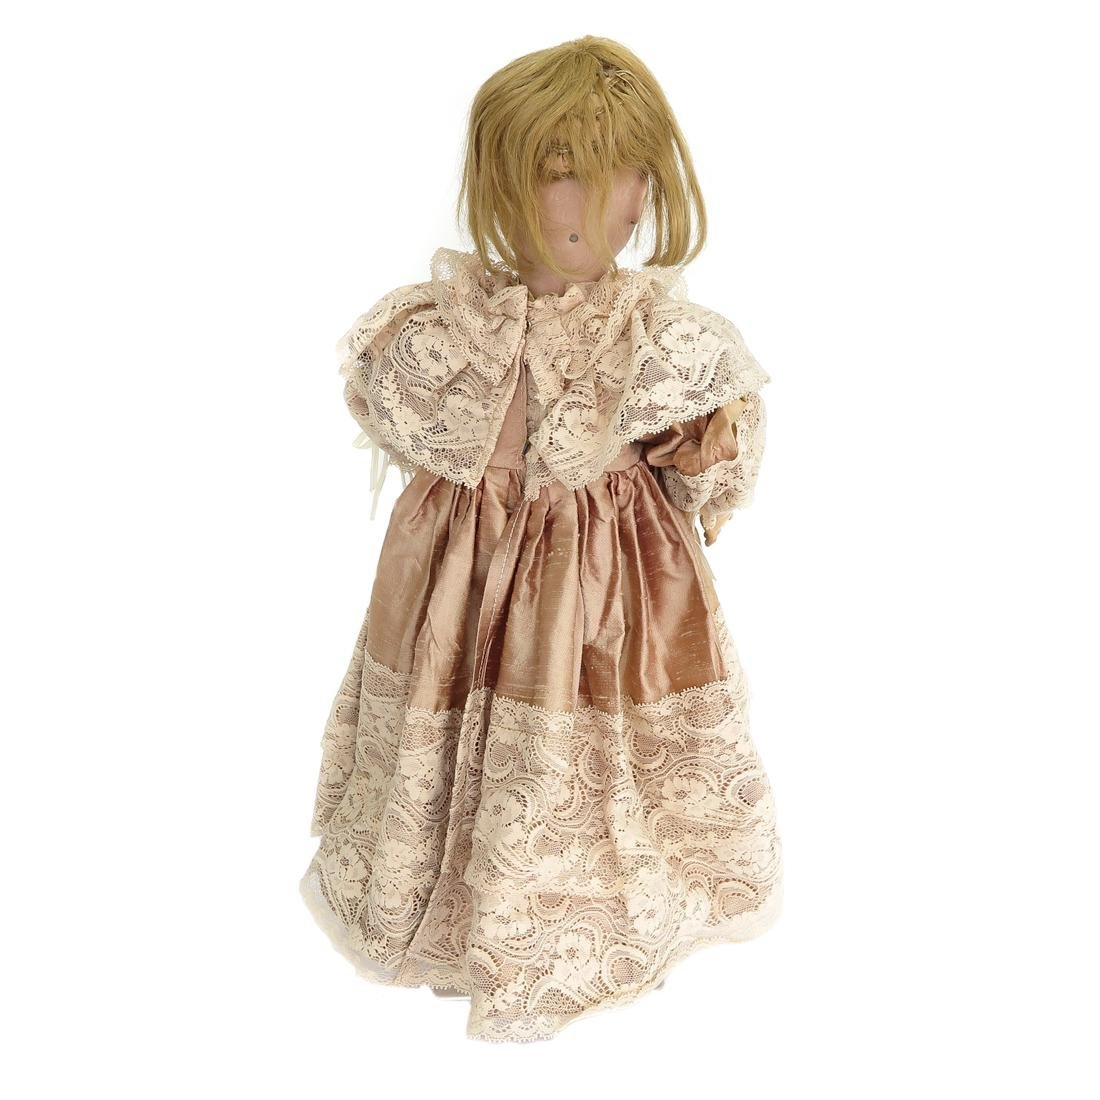 Henrich Handwerck / Simon Halbig Antique Doll - 2